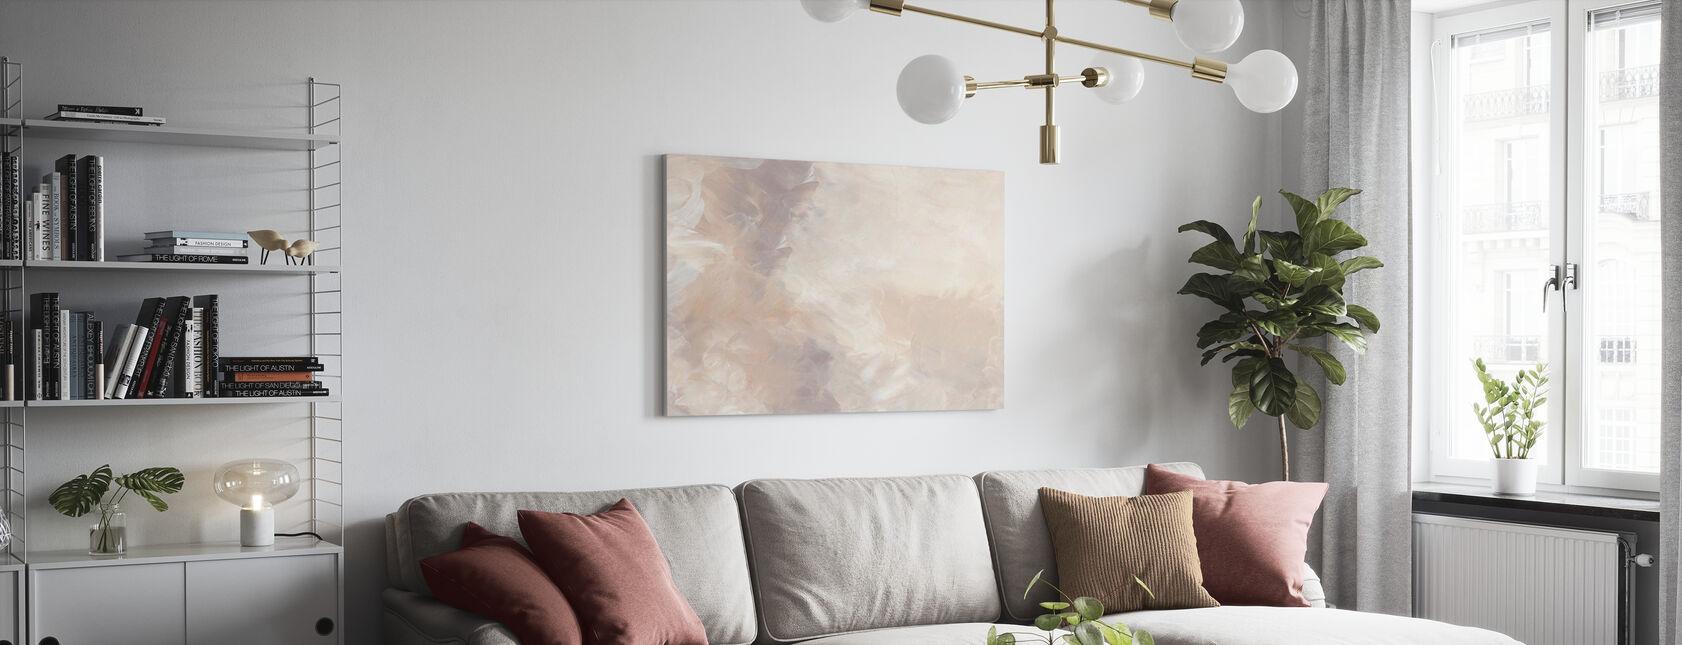 Blush Circular - Leinwandbild - Wohnzimmer